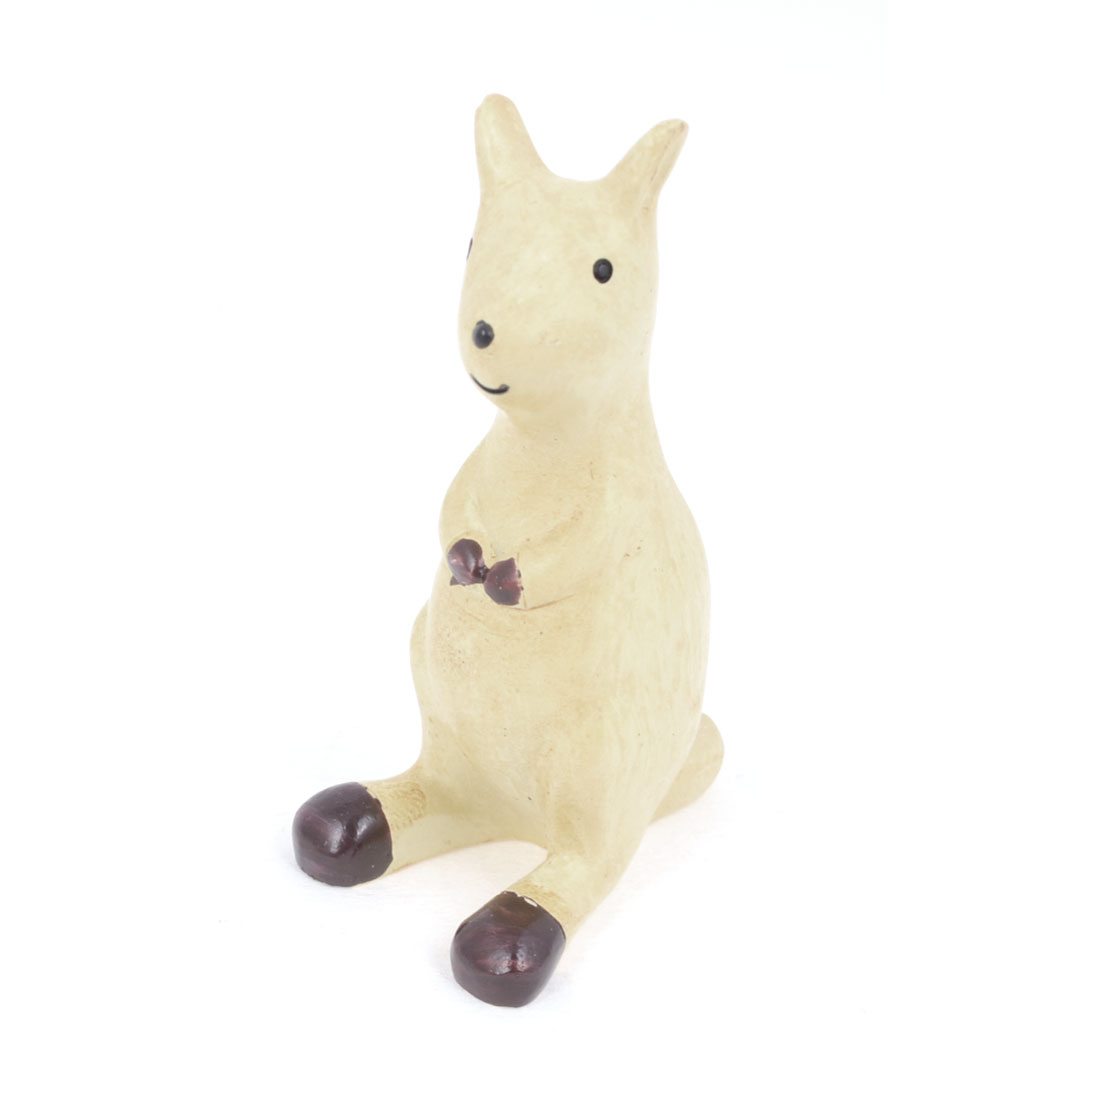 Office Desktop Beige Resin Handicraft Emulational Animal Kangaroo Ornament